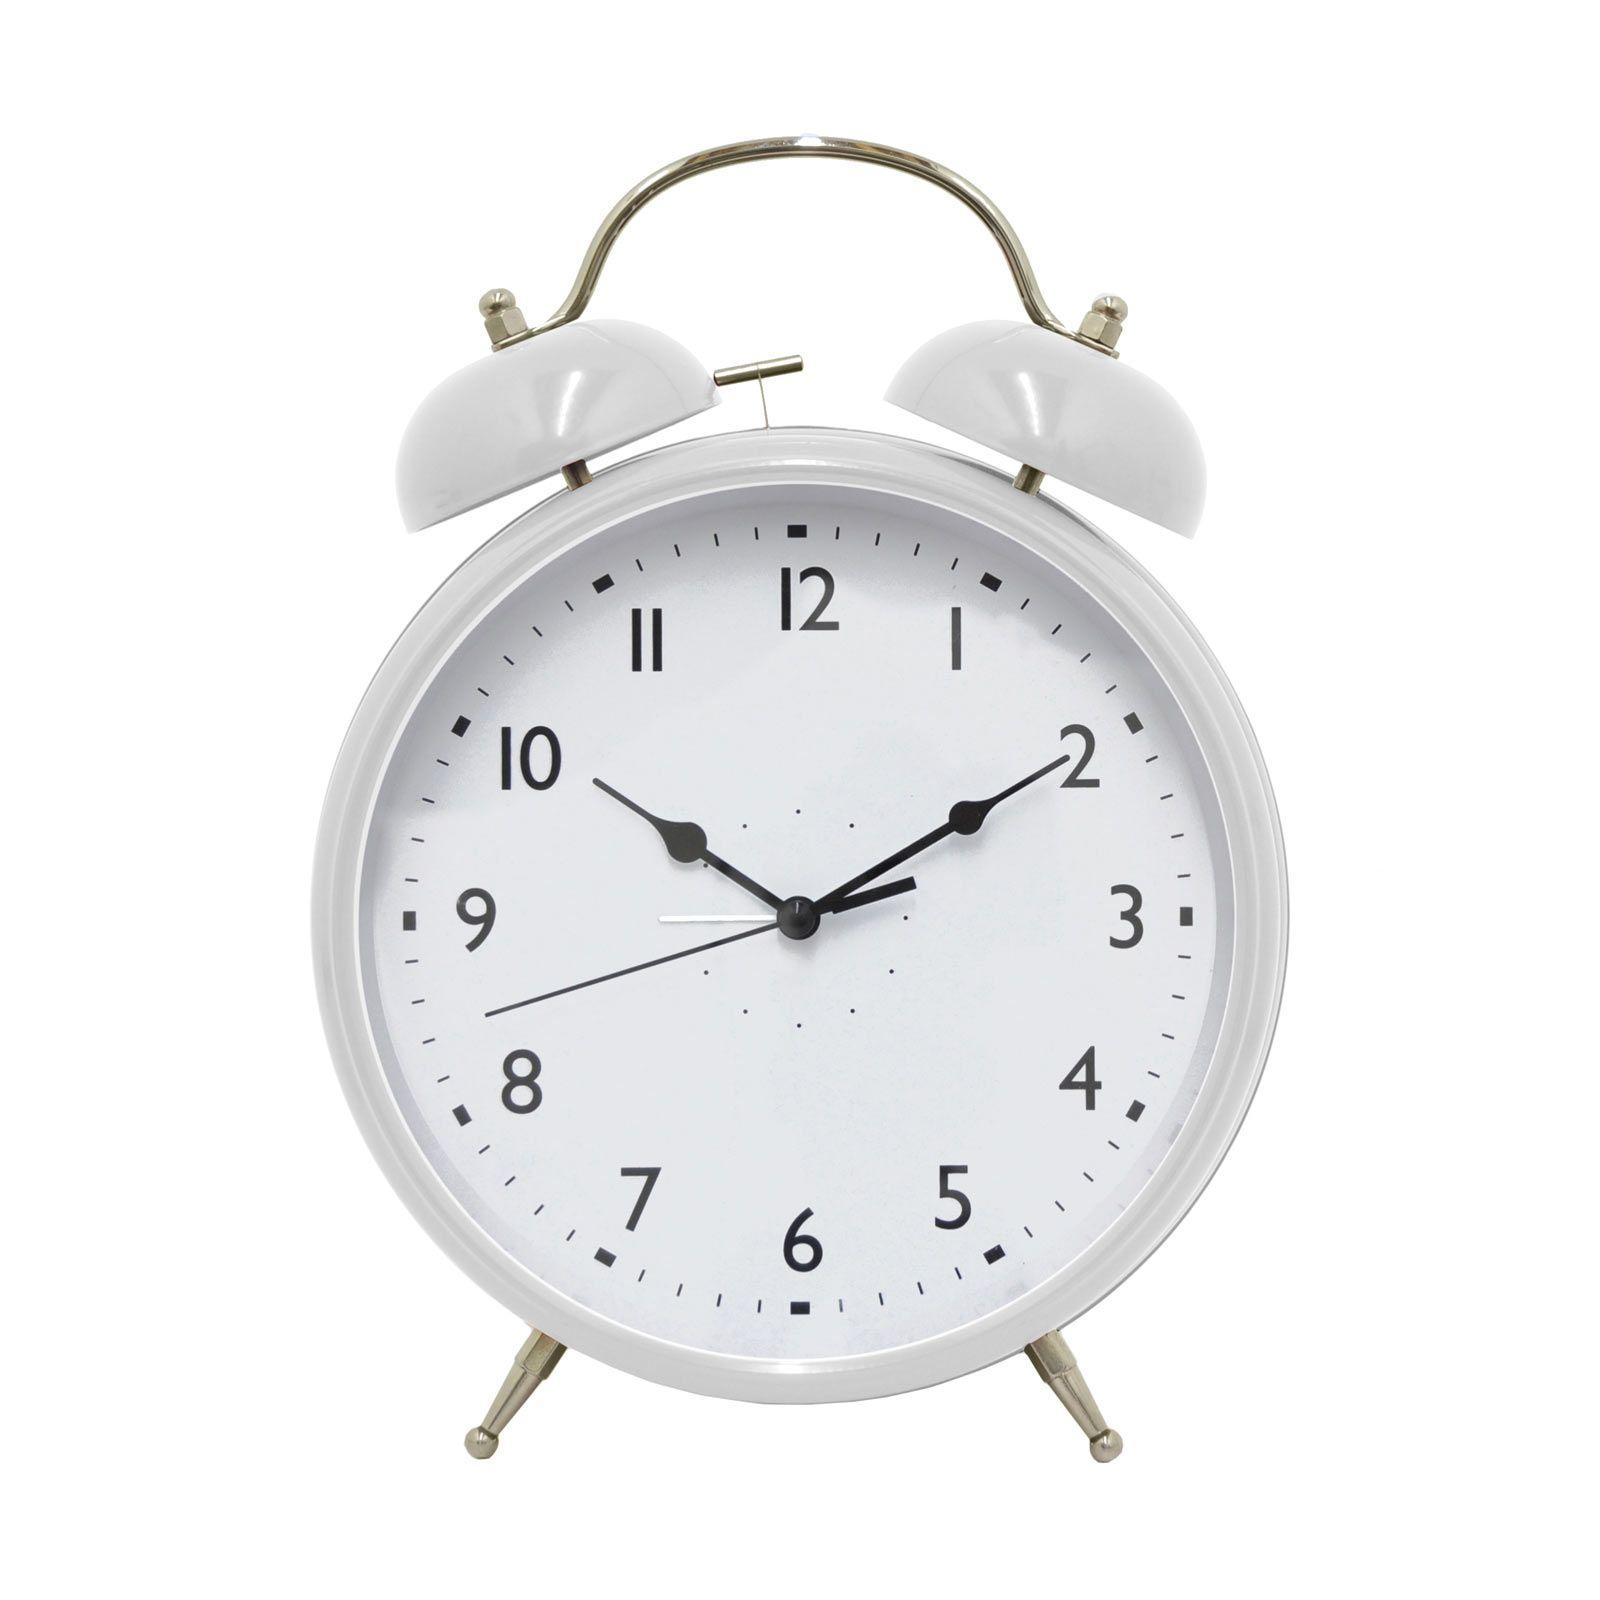 Timely Manner Alarm Clock Vintage Alarm Clocks Alarm Clock Dot And Bo